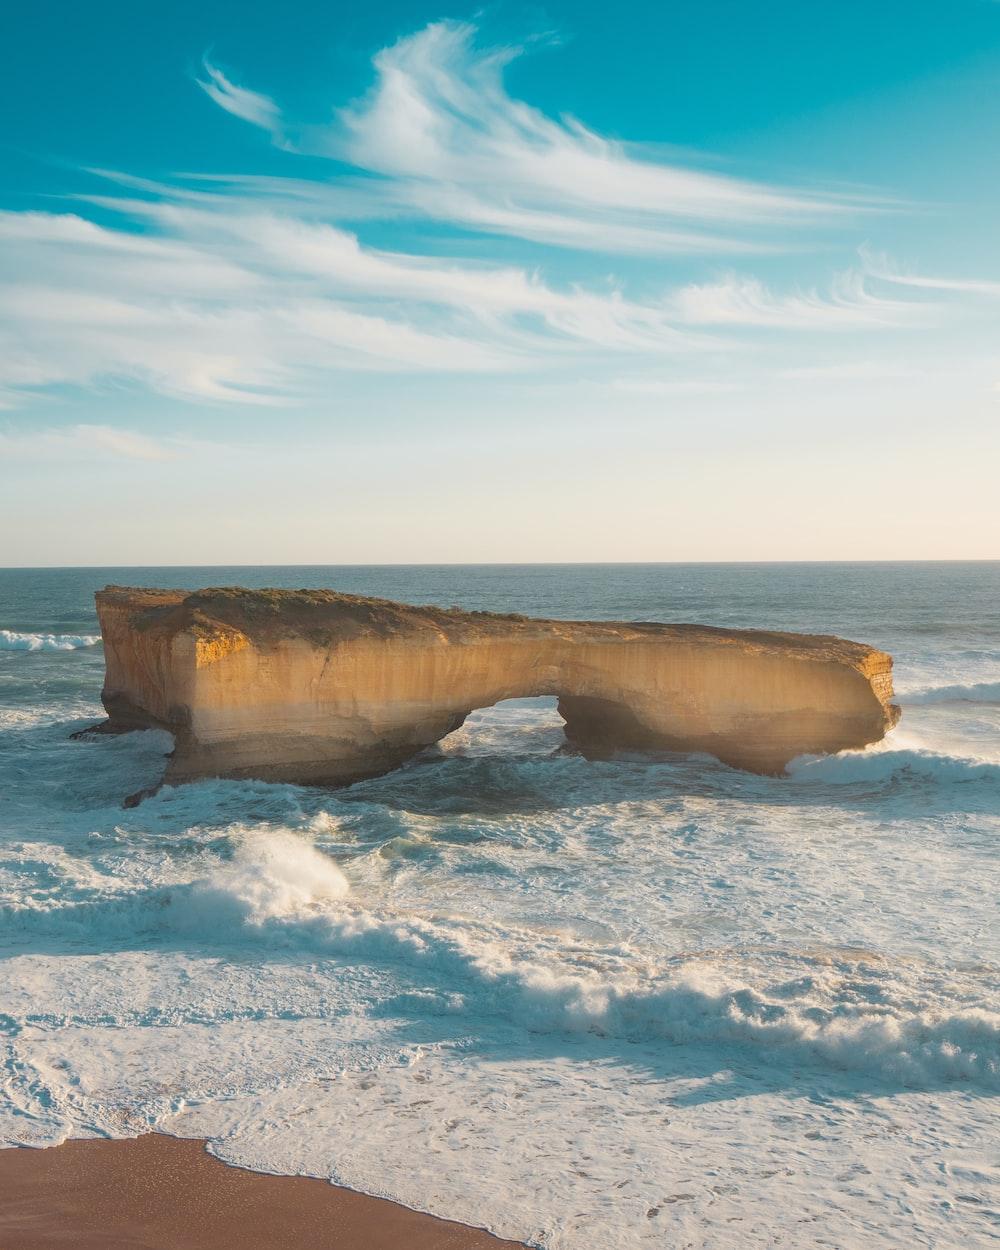 boulders body of water